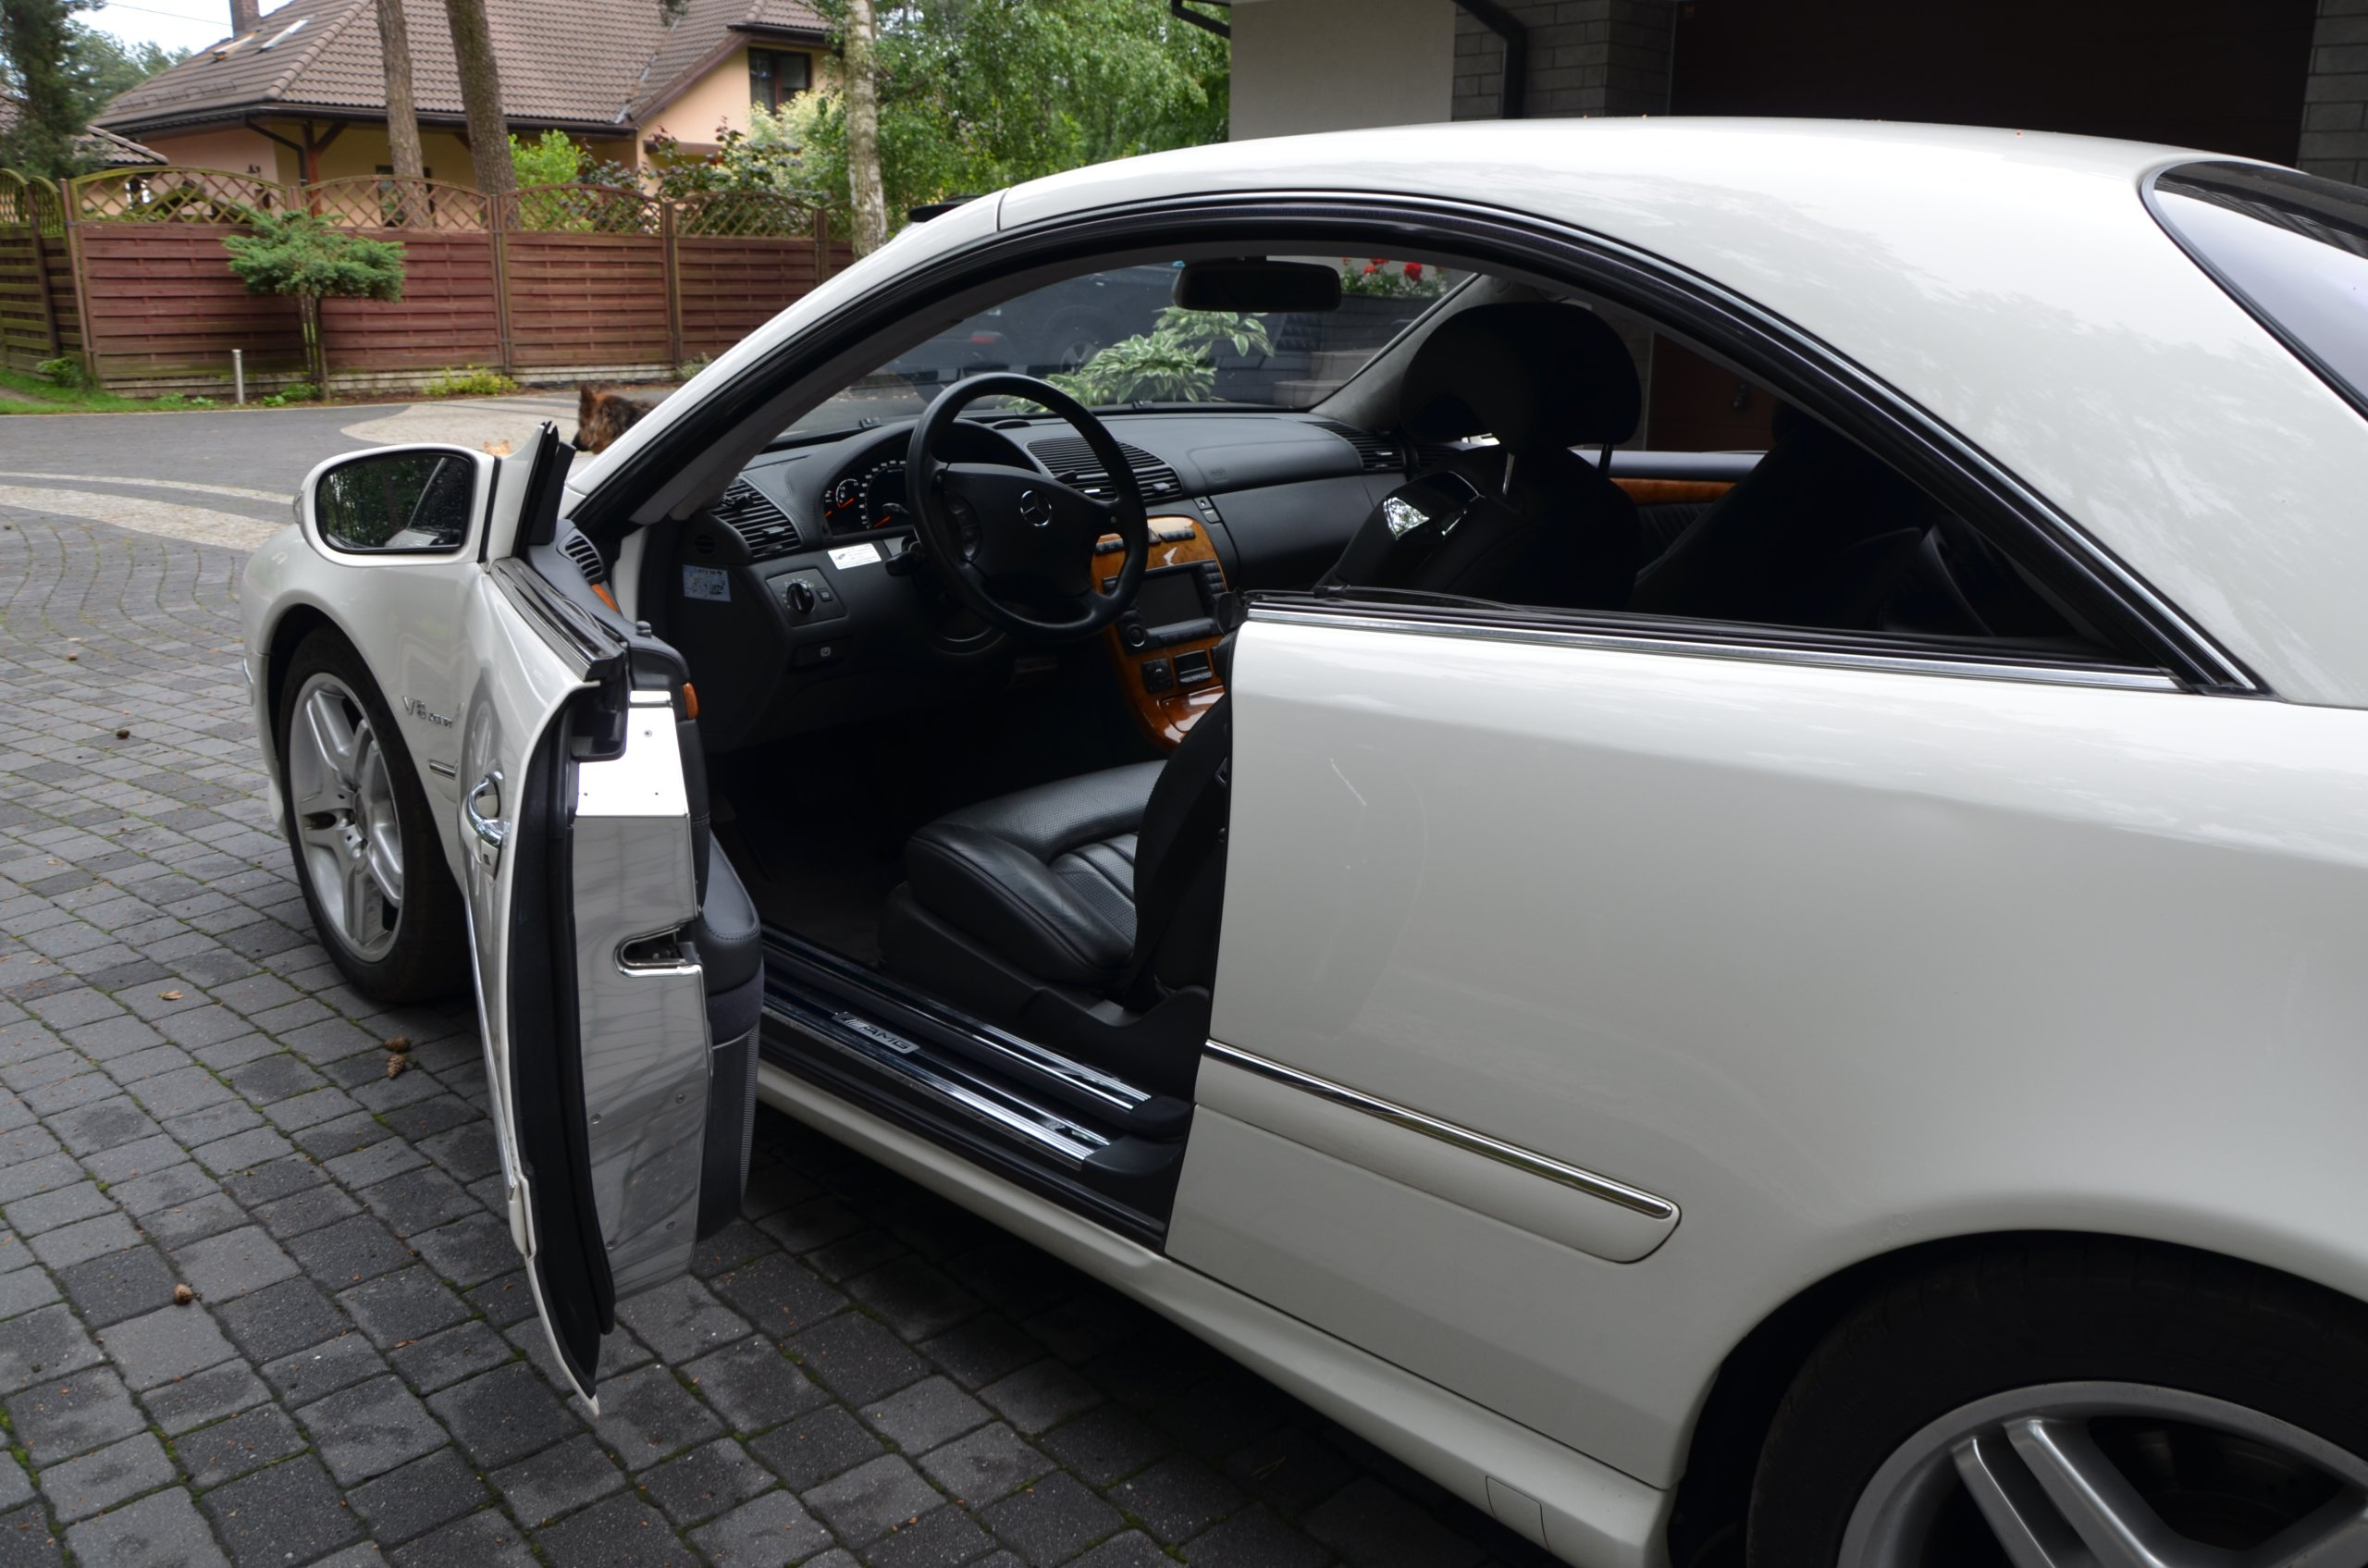 MERCEDES BENZ CL55 AMG COUPE Piękny 500KM OKAZJA